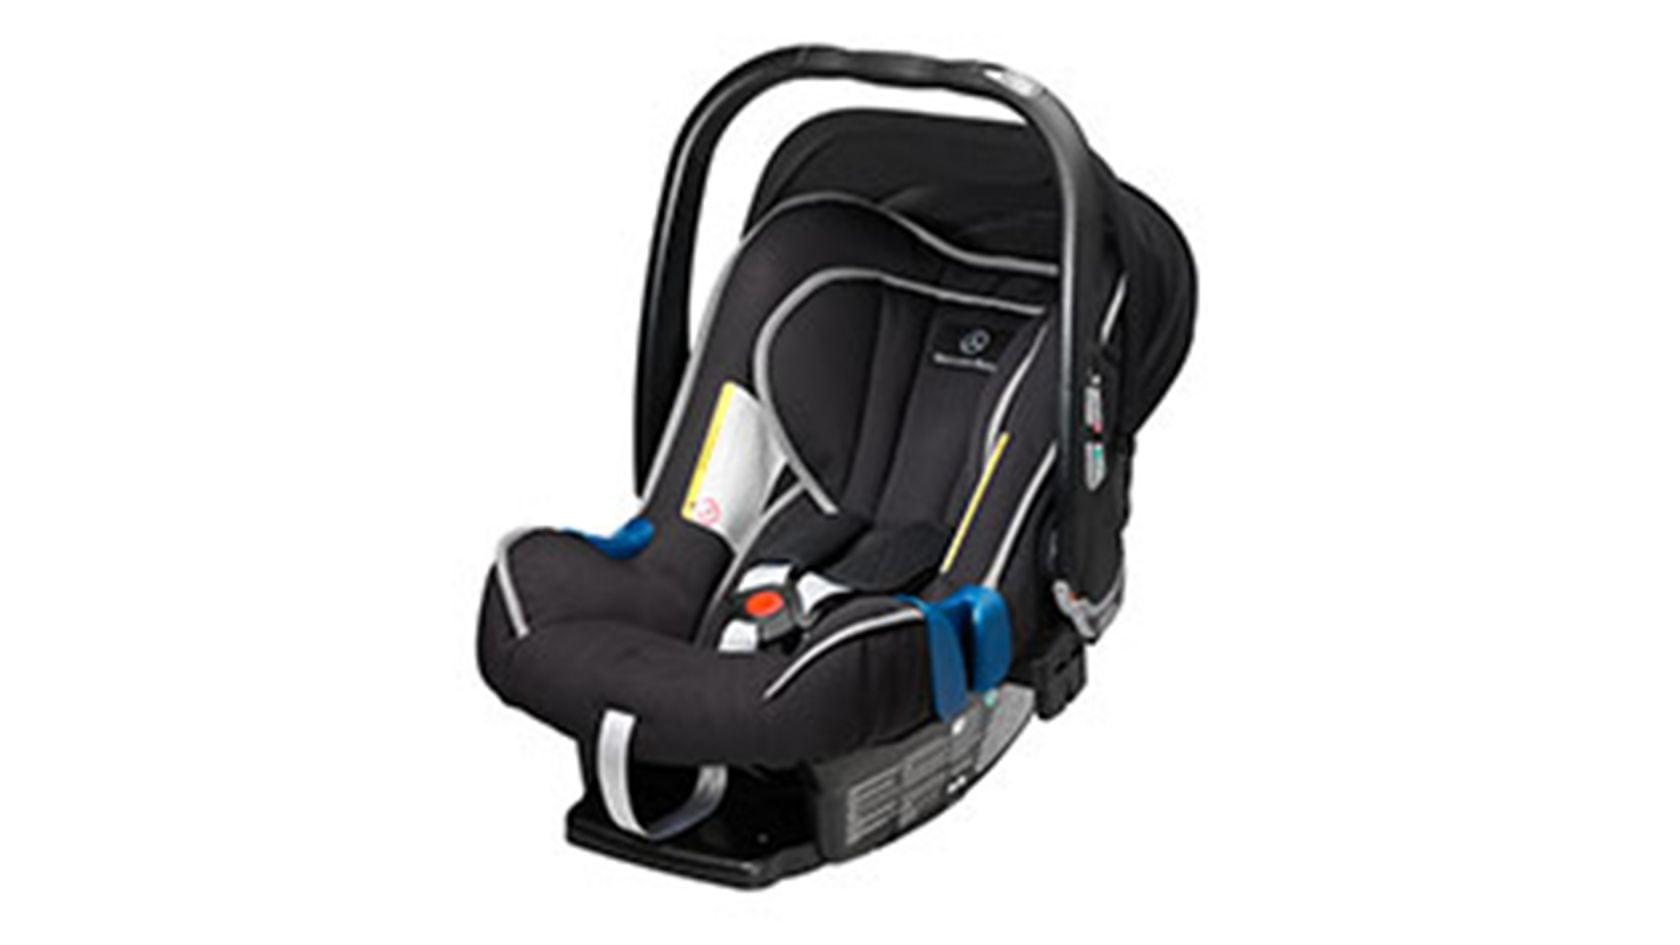 baby car seat interior mbclub uk bringing together mercedes enthusiasts. Black Bedroom Furniture Sets. Home Design Ideas